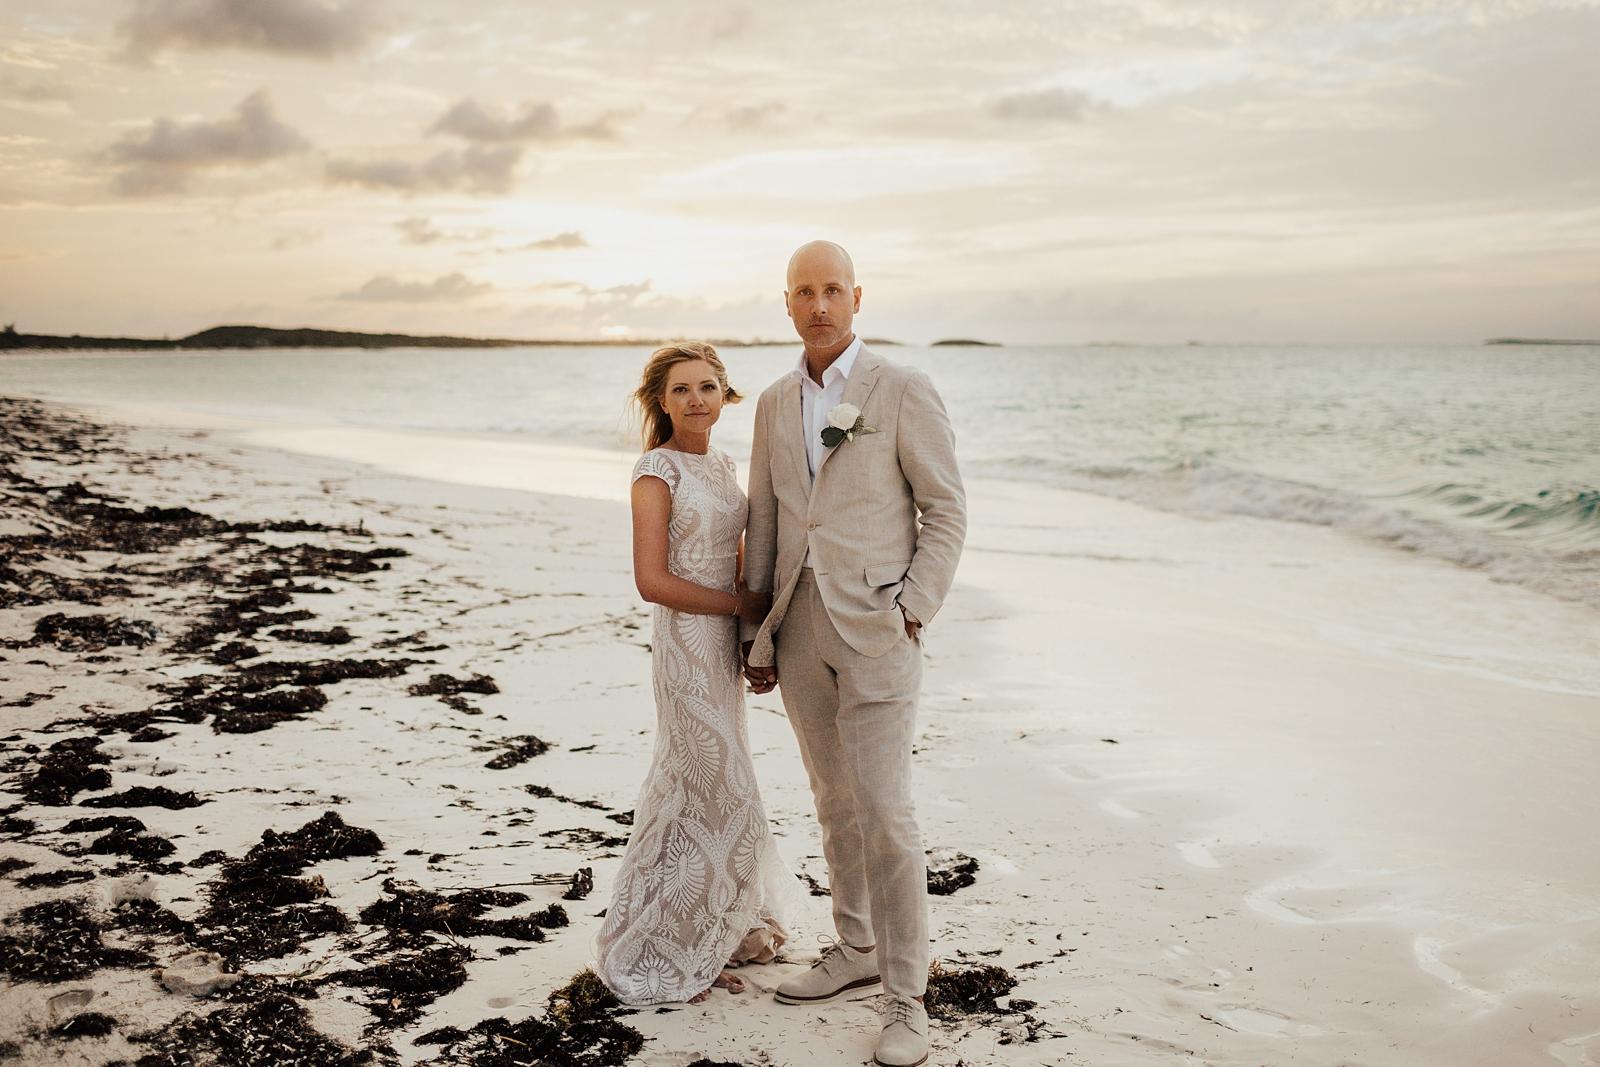 Jenni & Andrew Intimate Beach Destination Wedding in Little Exuma, Bahamas_0527.jpg